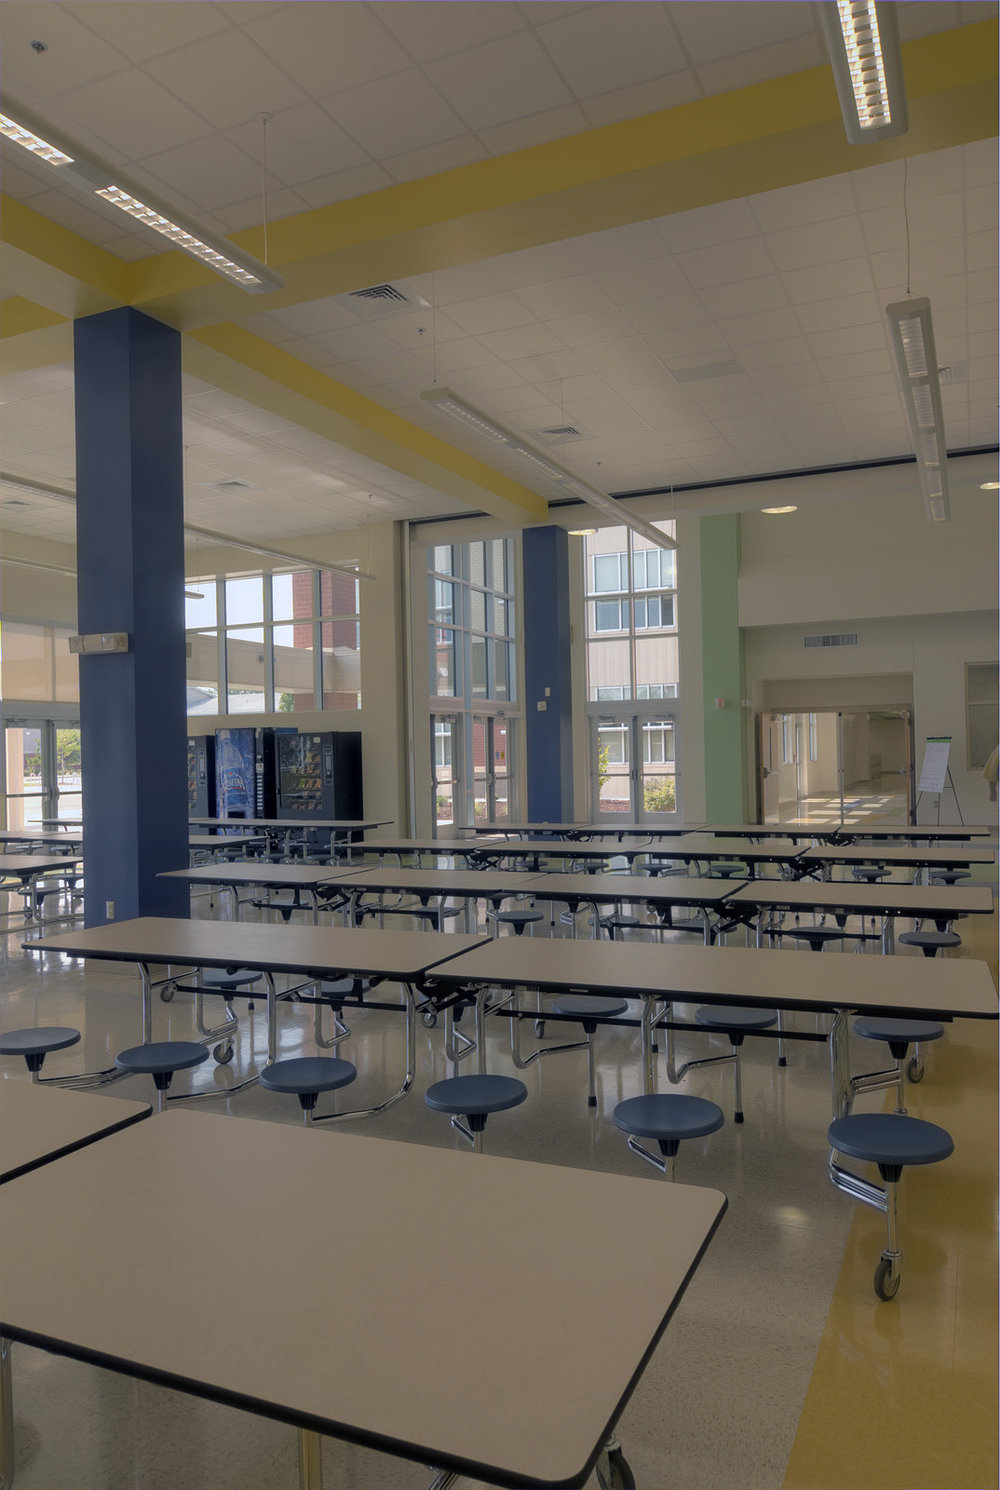 1029-cafeteria-02.jpg